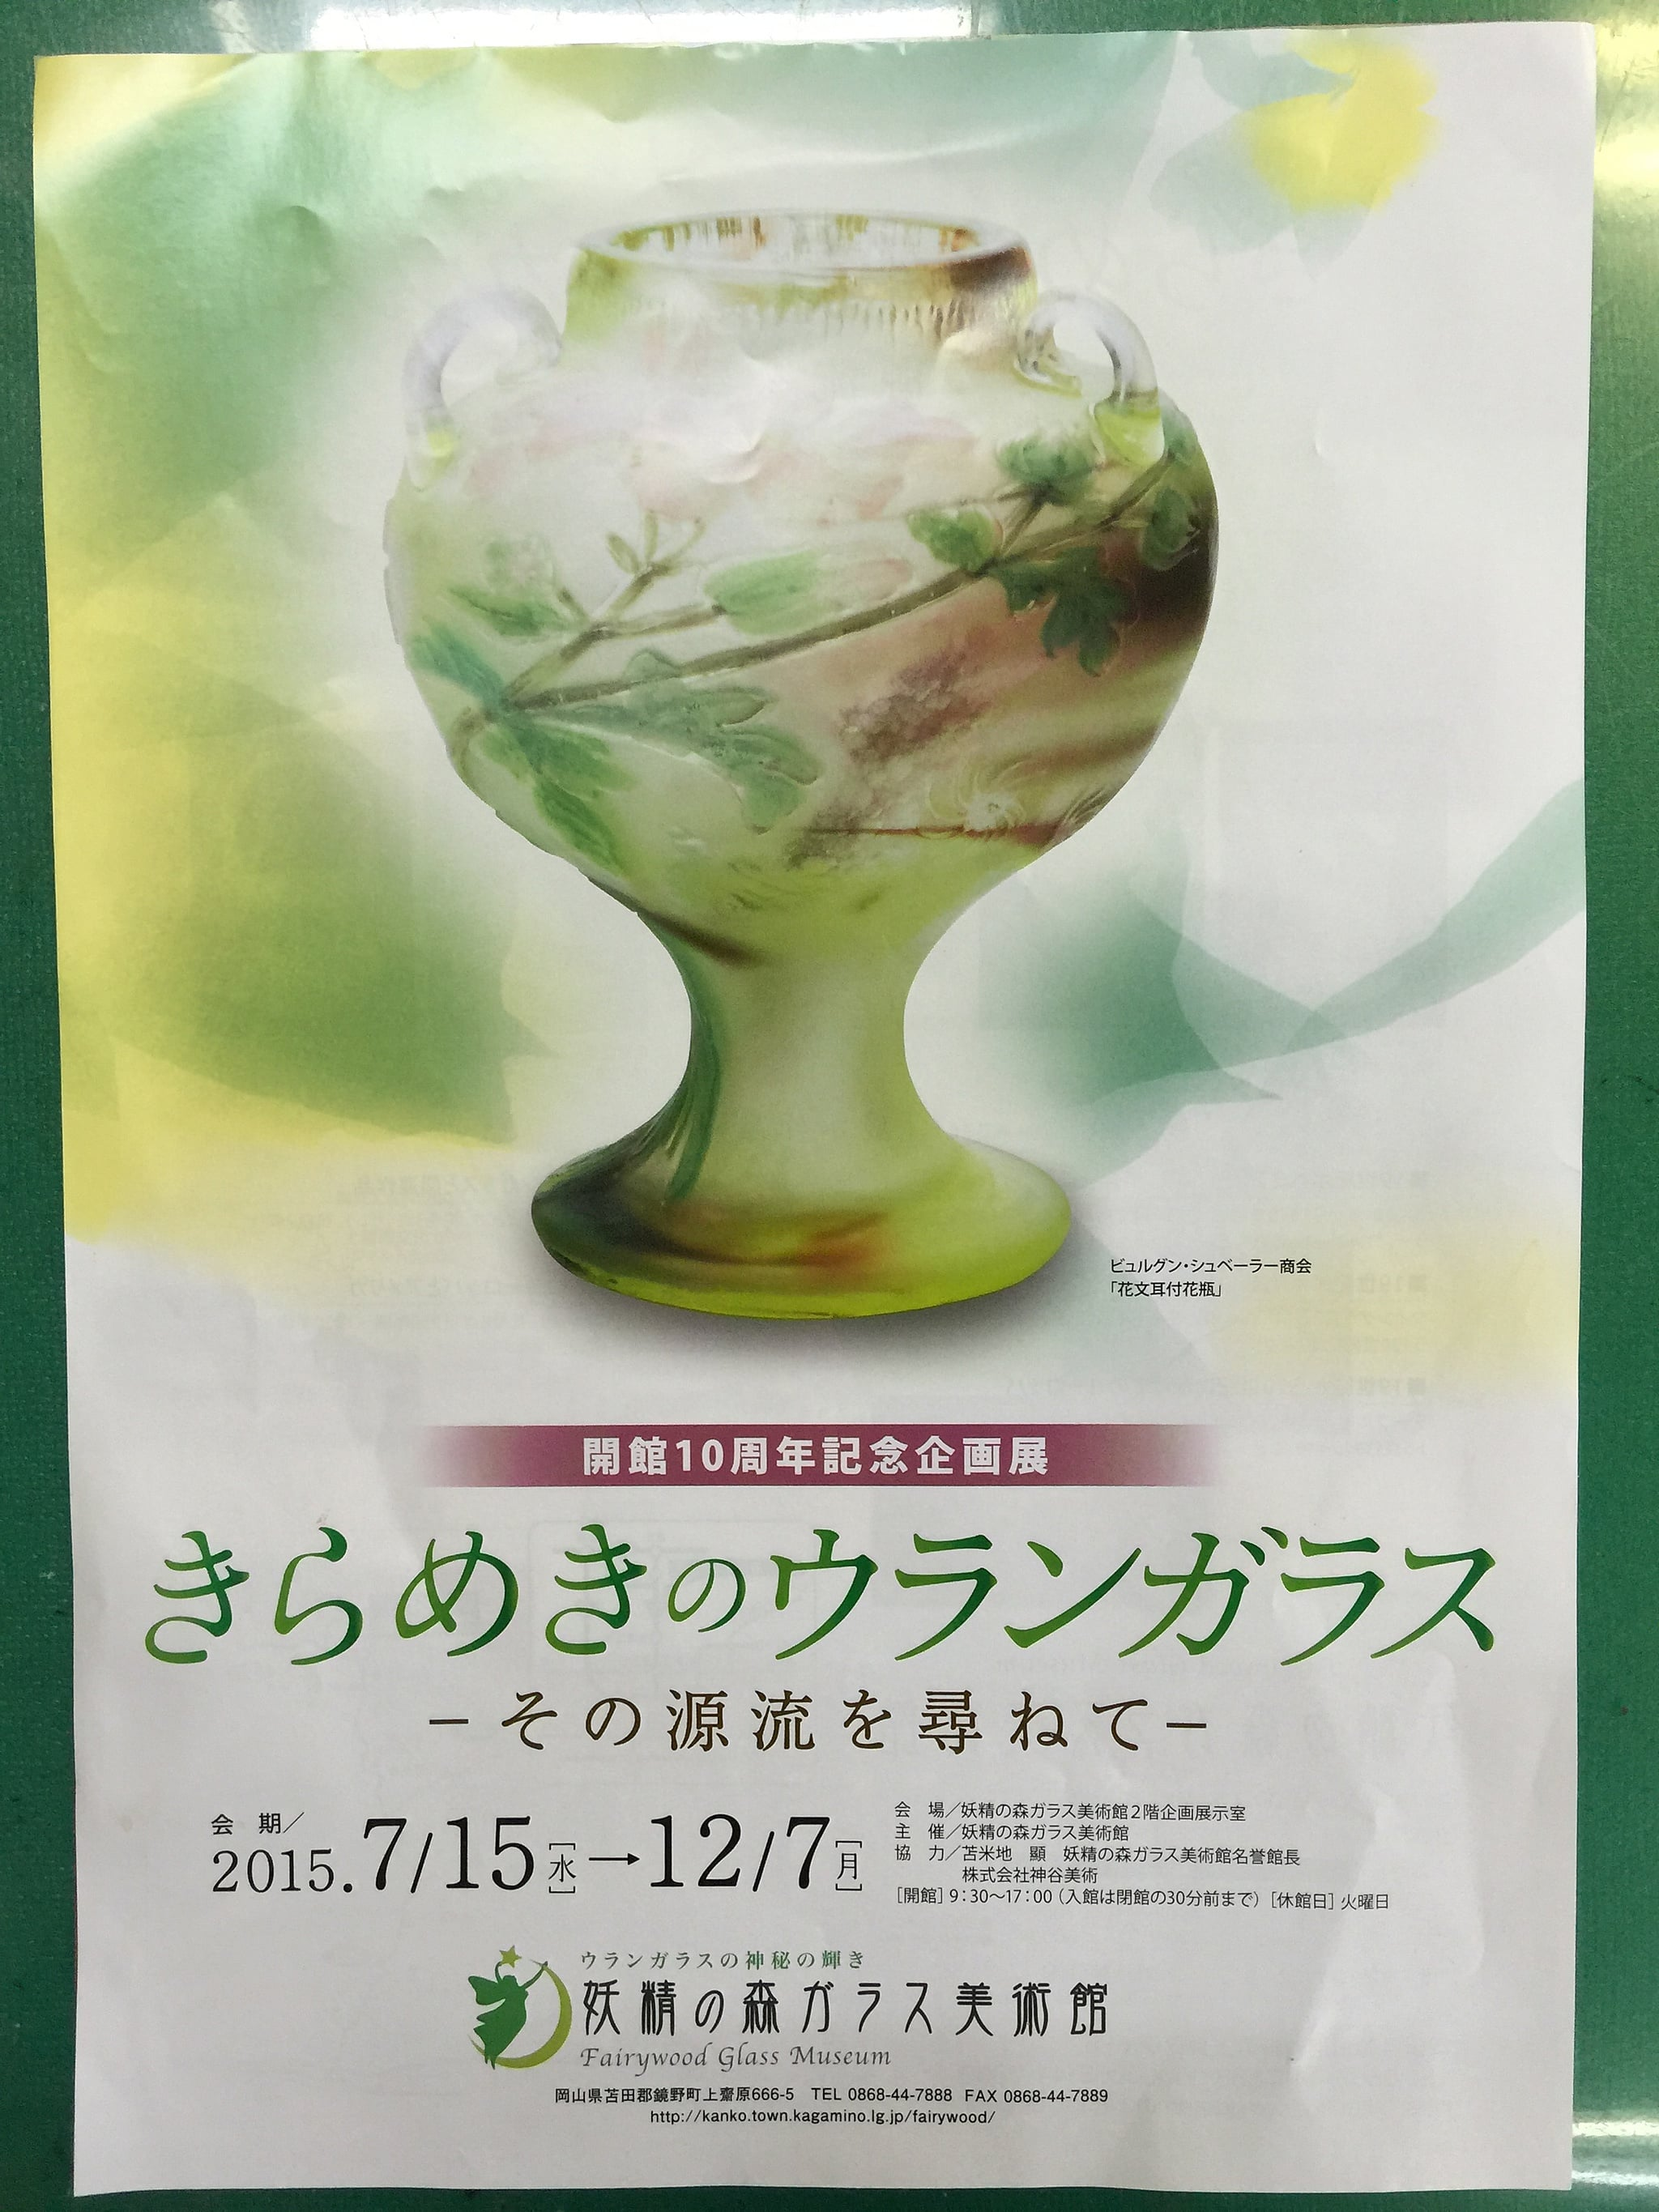 http://ogura-sekkei.jp/files/libs/17/2015110916344627.JPG